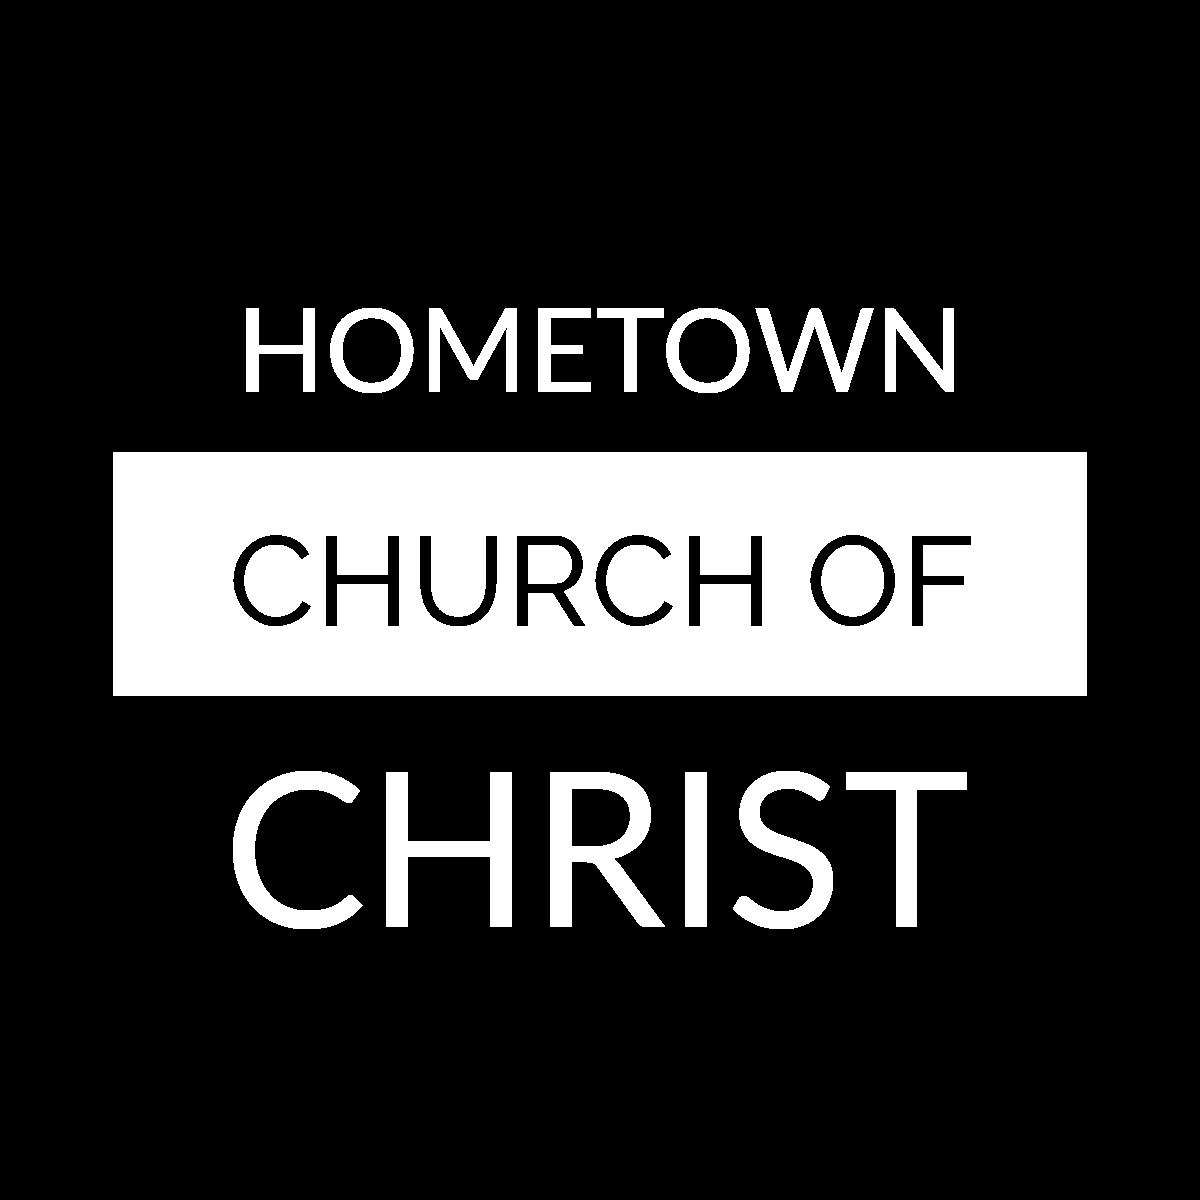 Hometown church of Christ